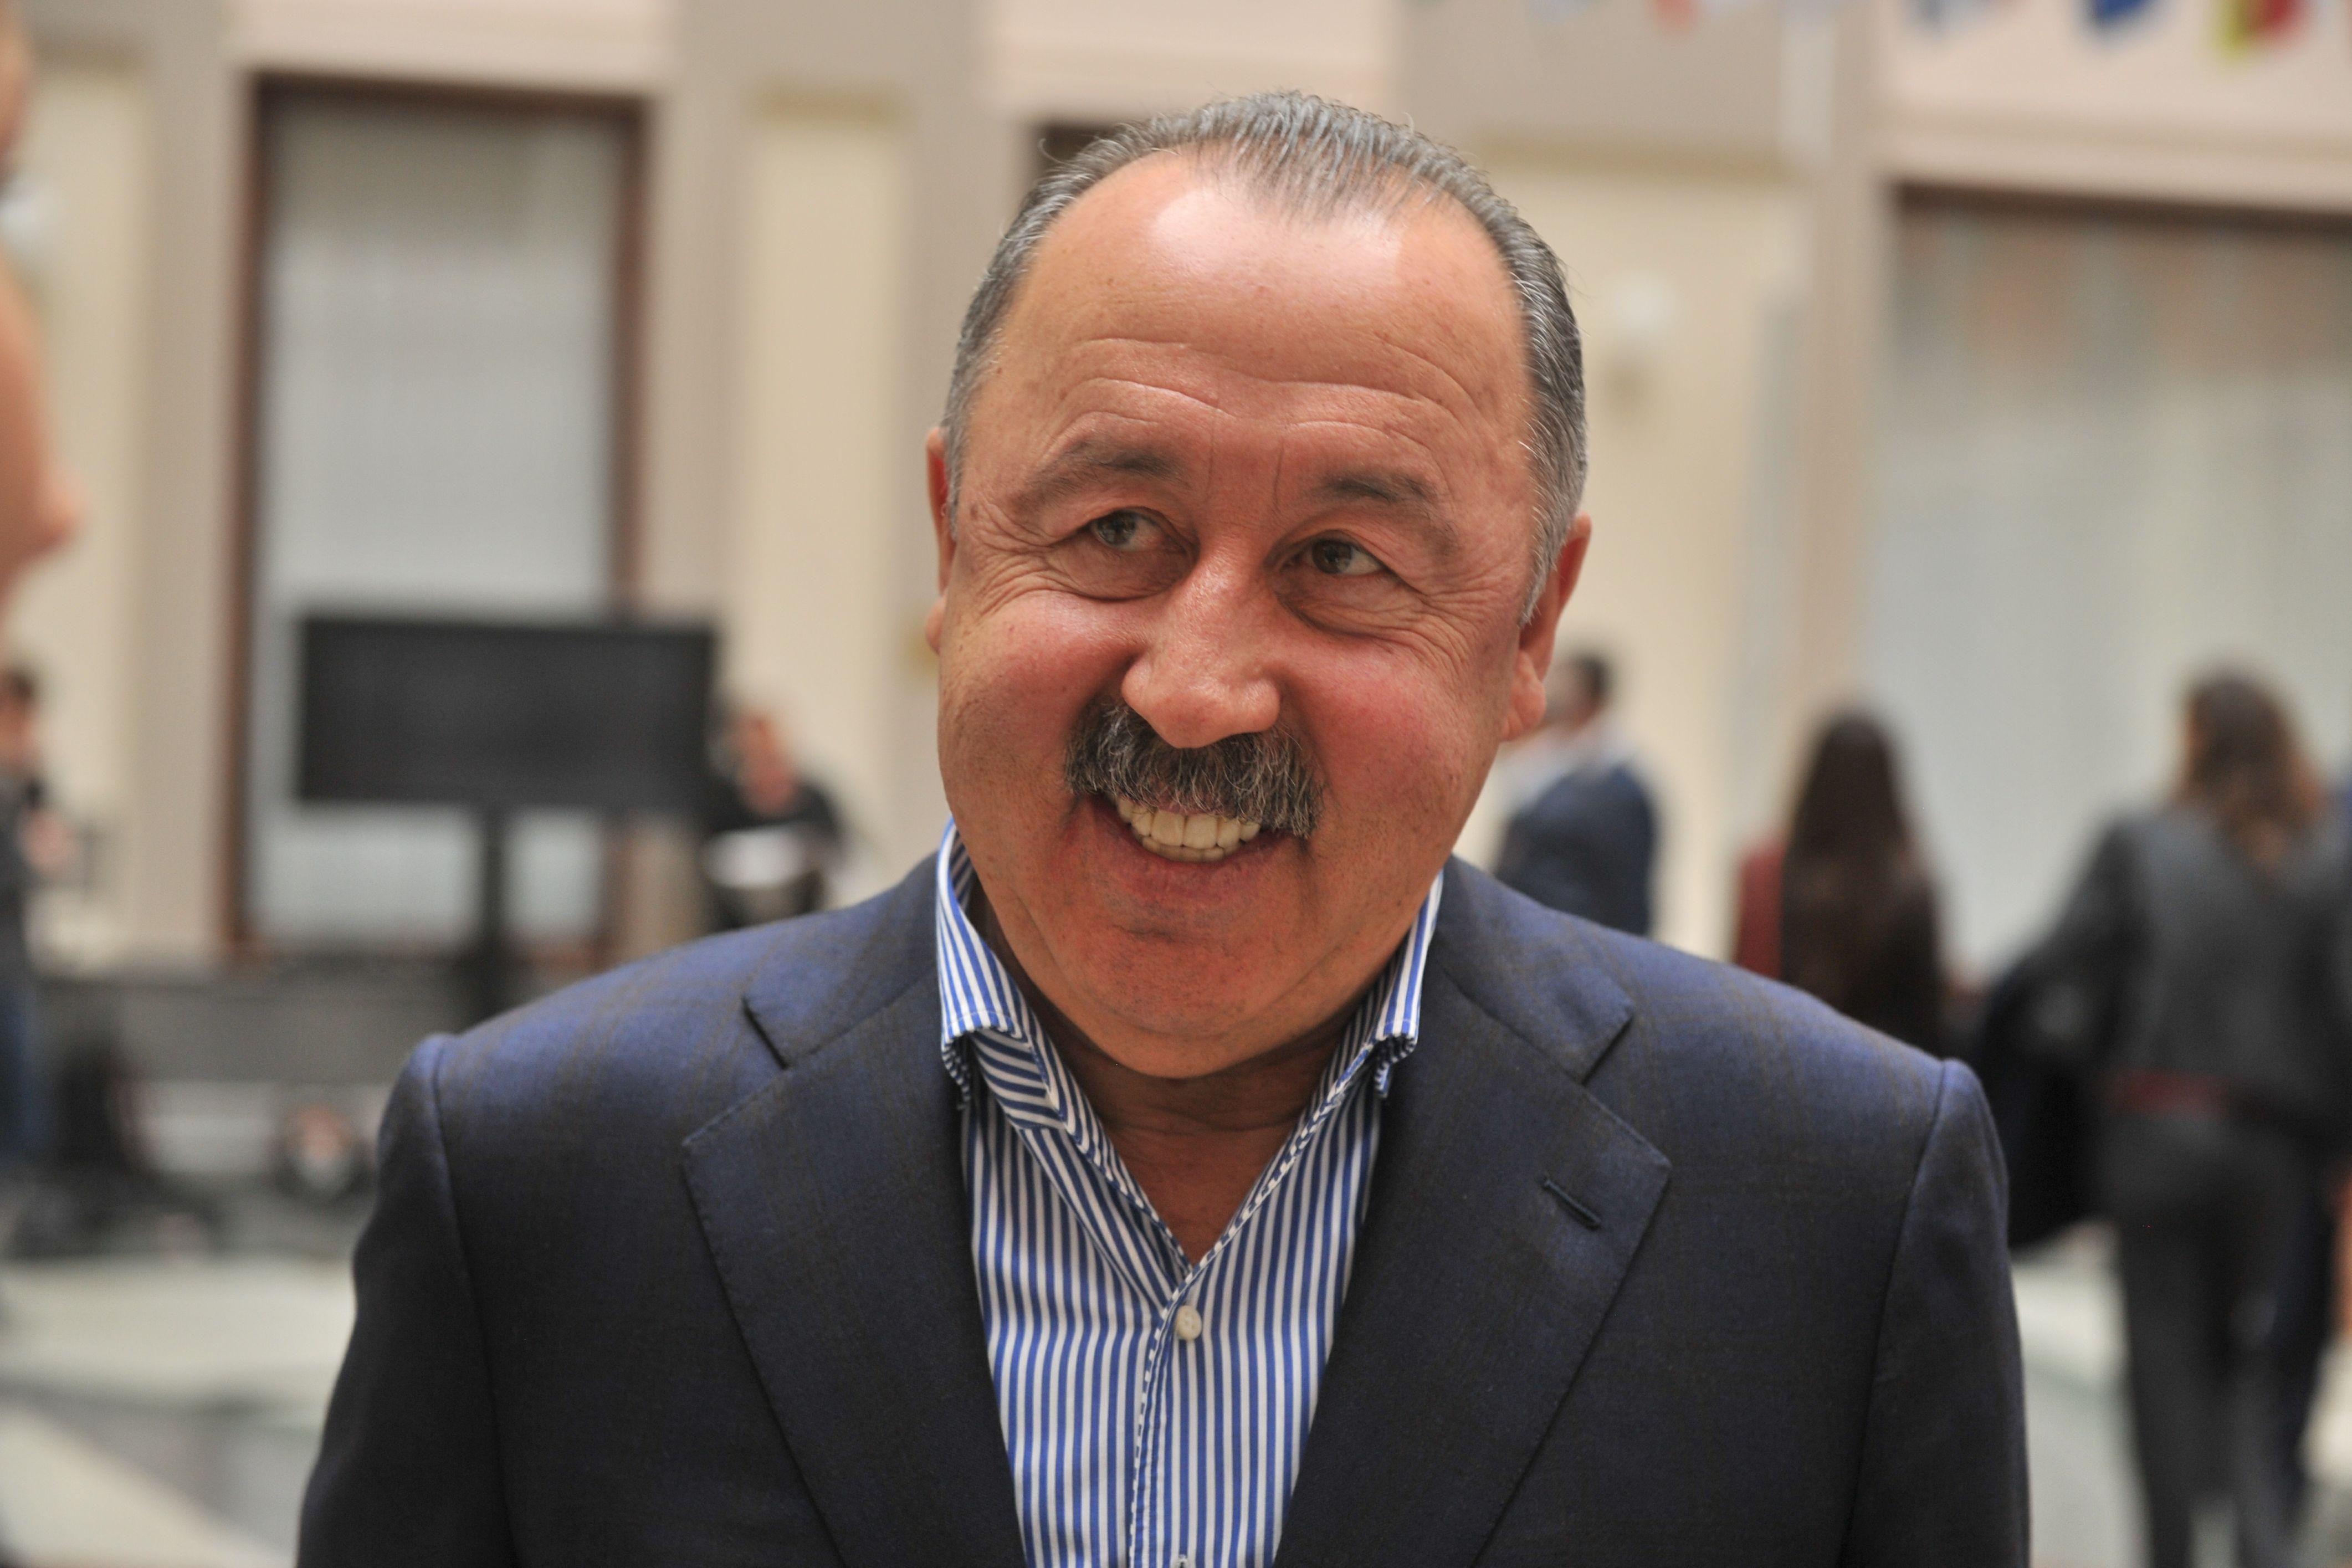 Газзаев - об уходе Онопко и Овчинникова из ЦСКА: Решения президента не с потолка идут